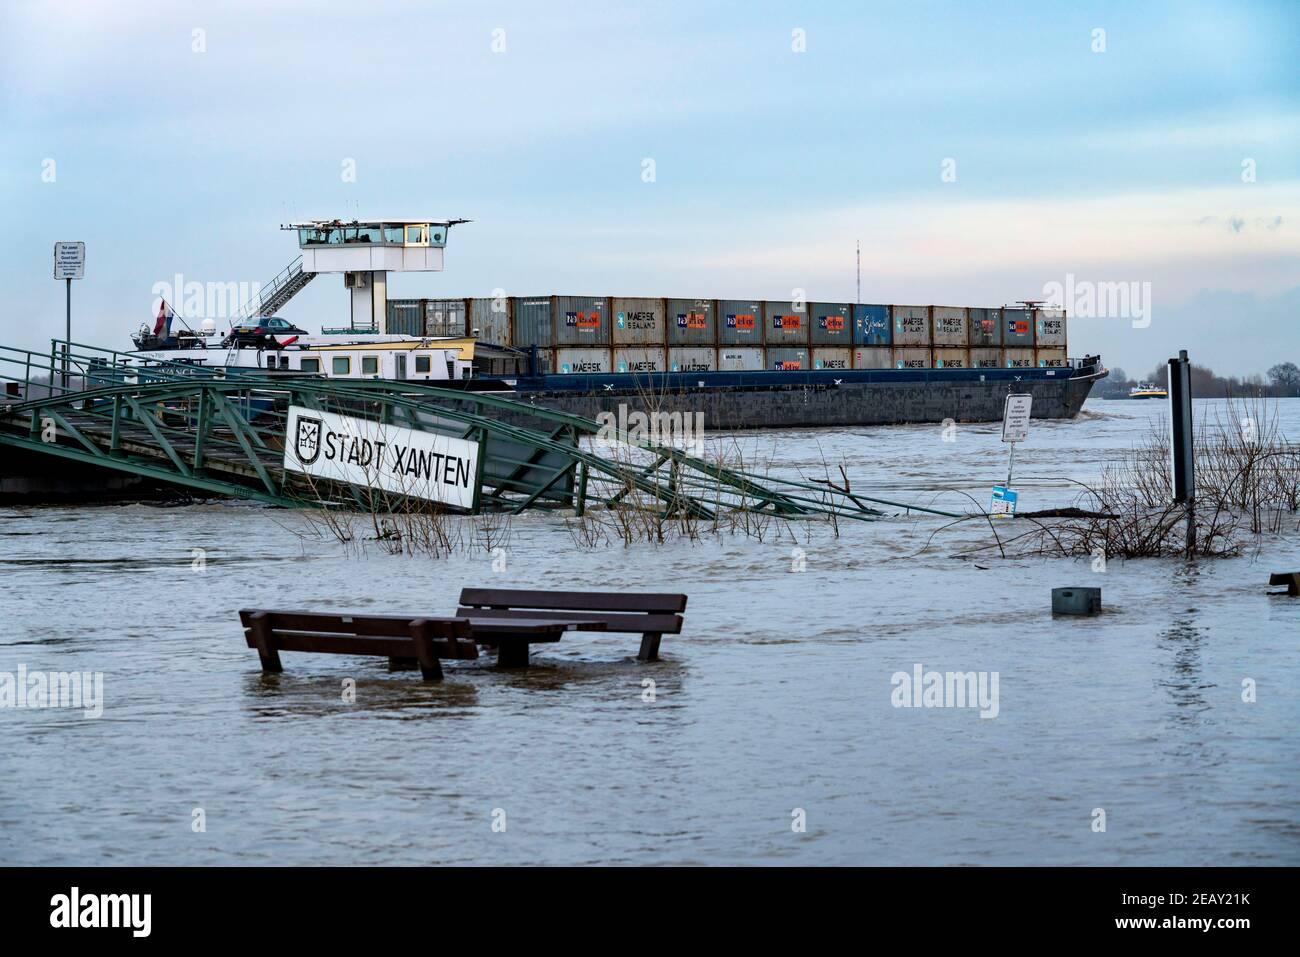 High water on the Rhine, flooded Rhine bank, old ferry landing stage, Rhine meadows, near Xanten, Bislicher Insel, Lower Rhine, NRW, Germany, Stock Photo